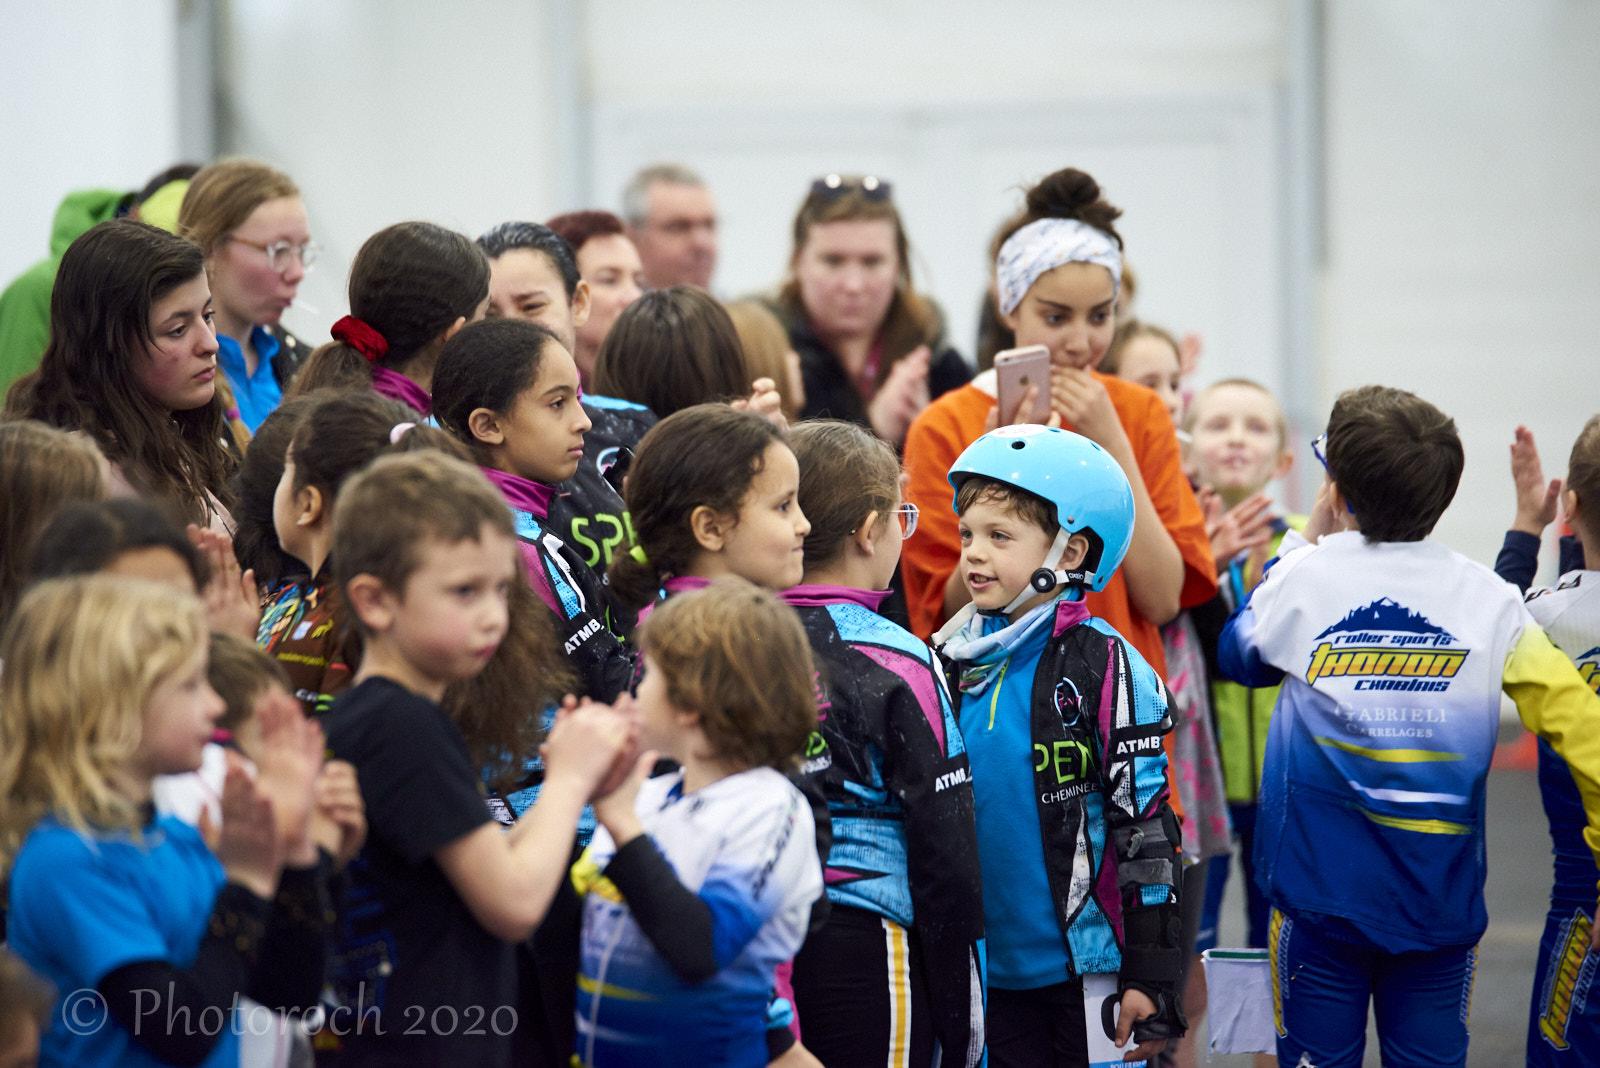 012 Kid's Roller au Villeventus 29 février 2020